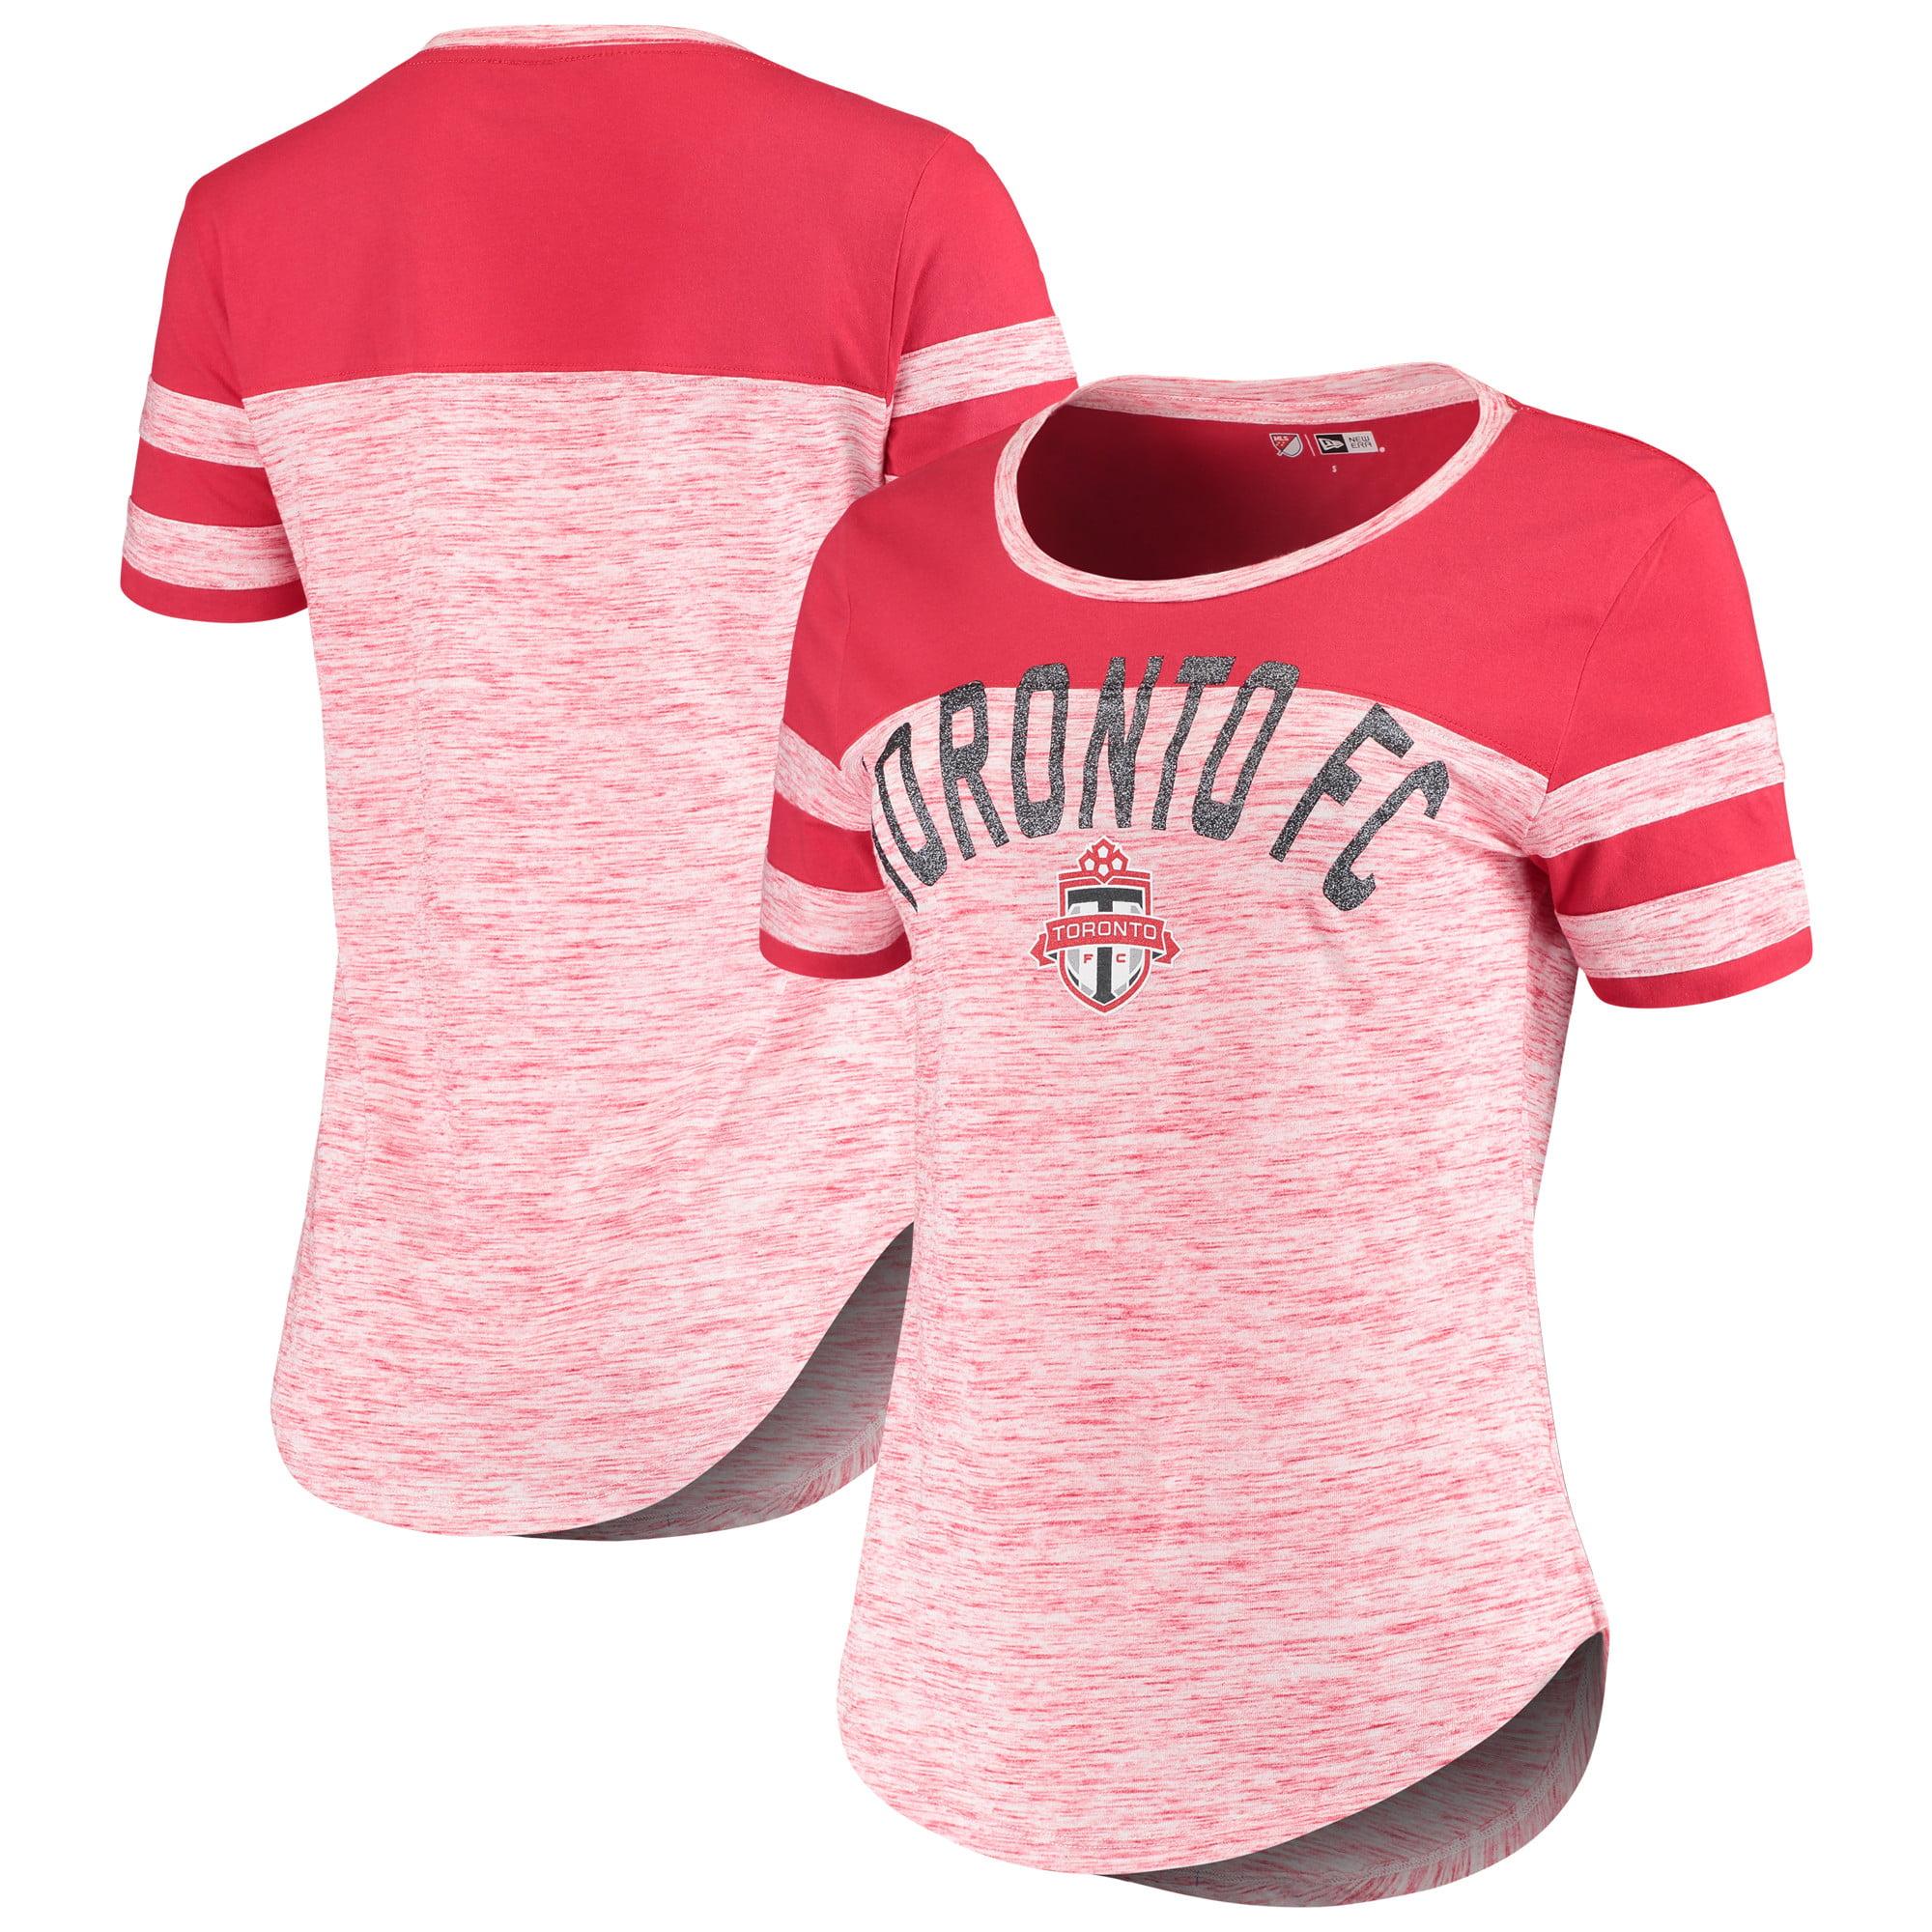 Toronto FC 5th & Ocean by New Era Women's Space Dye Scoop T-Shirt - Red